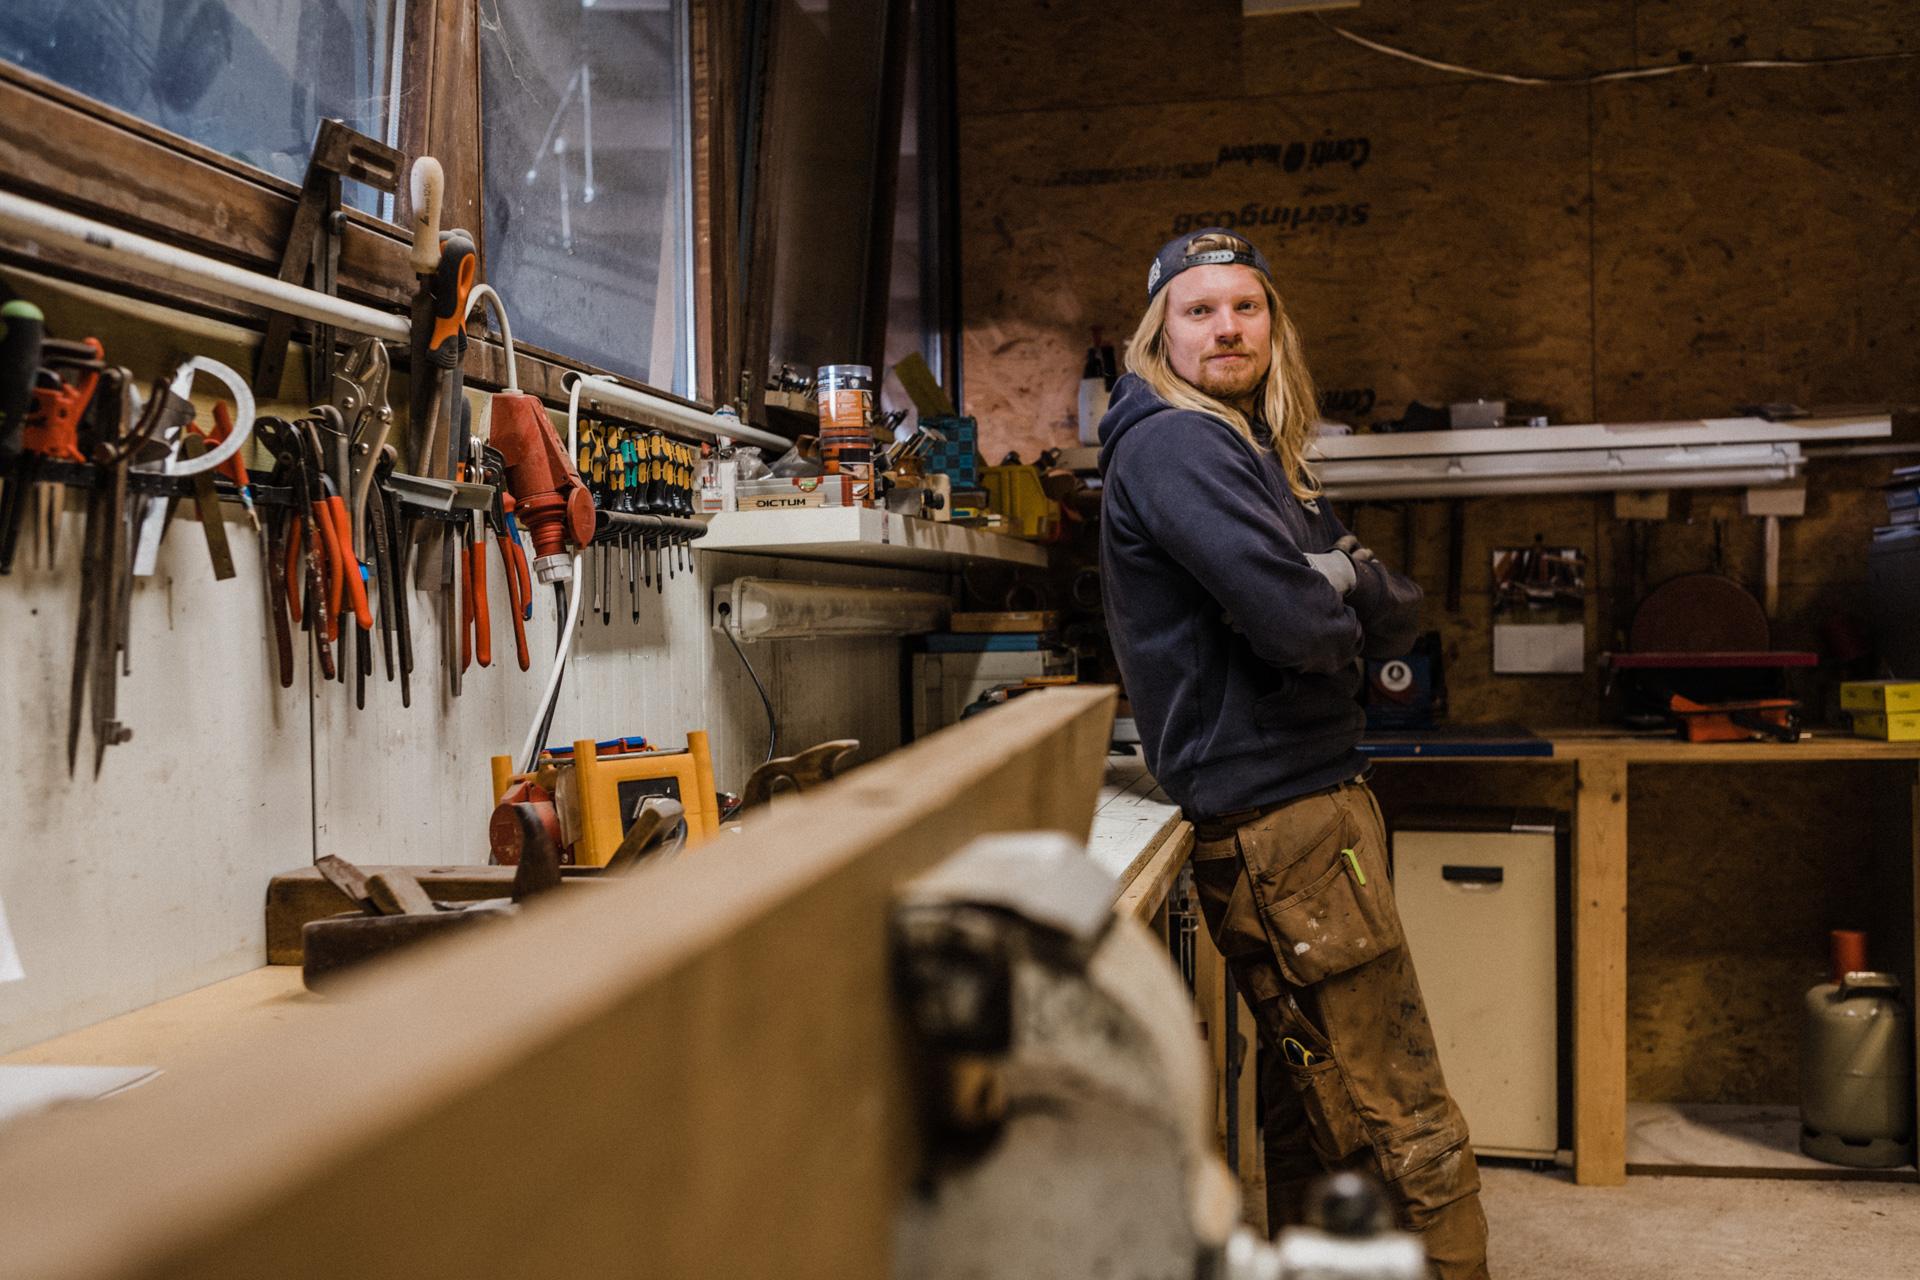 Bootsbaumeister - Thomas Degen